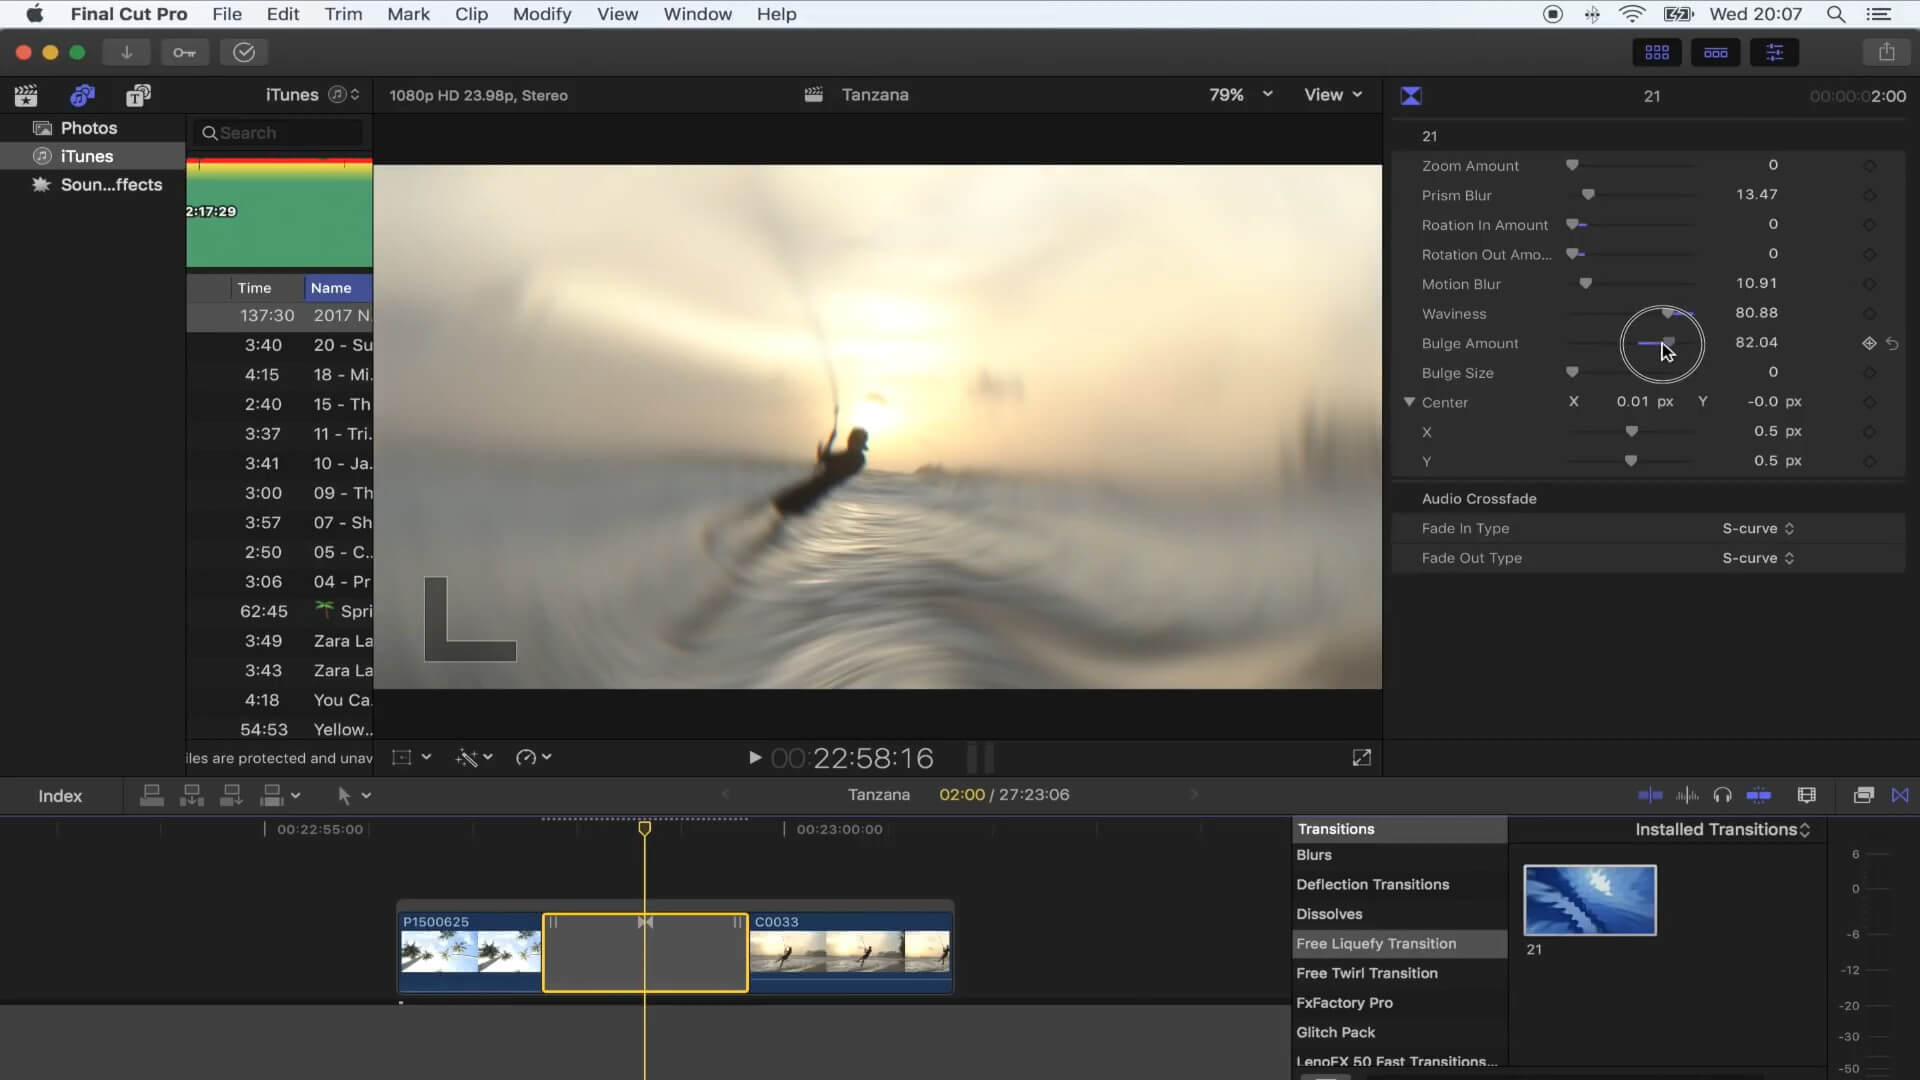 FCPX液化溶解转场效果插件 Vlog常用流行转场